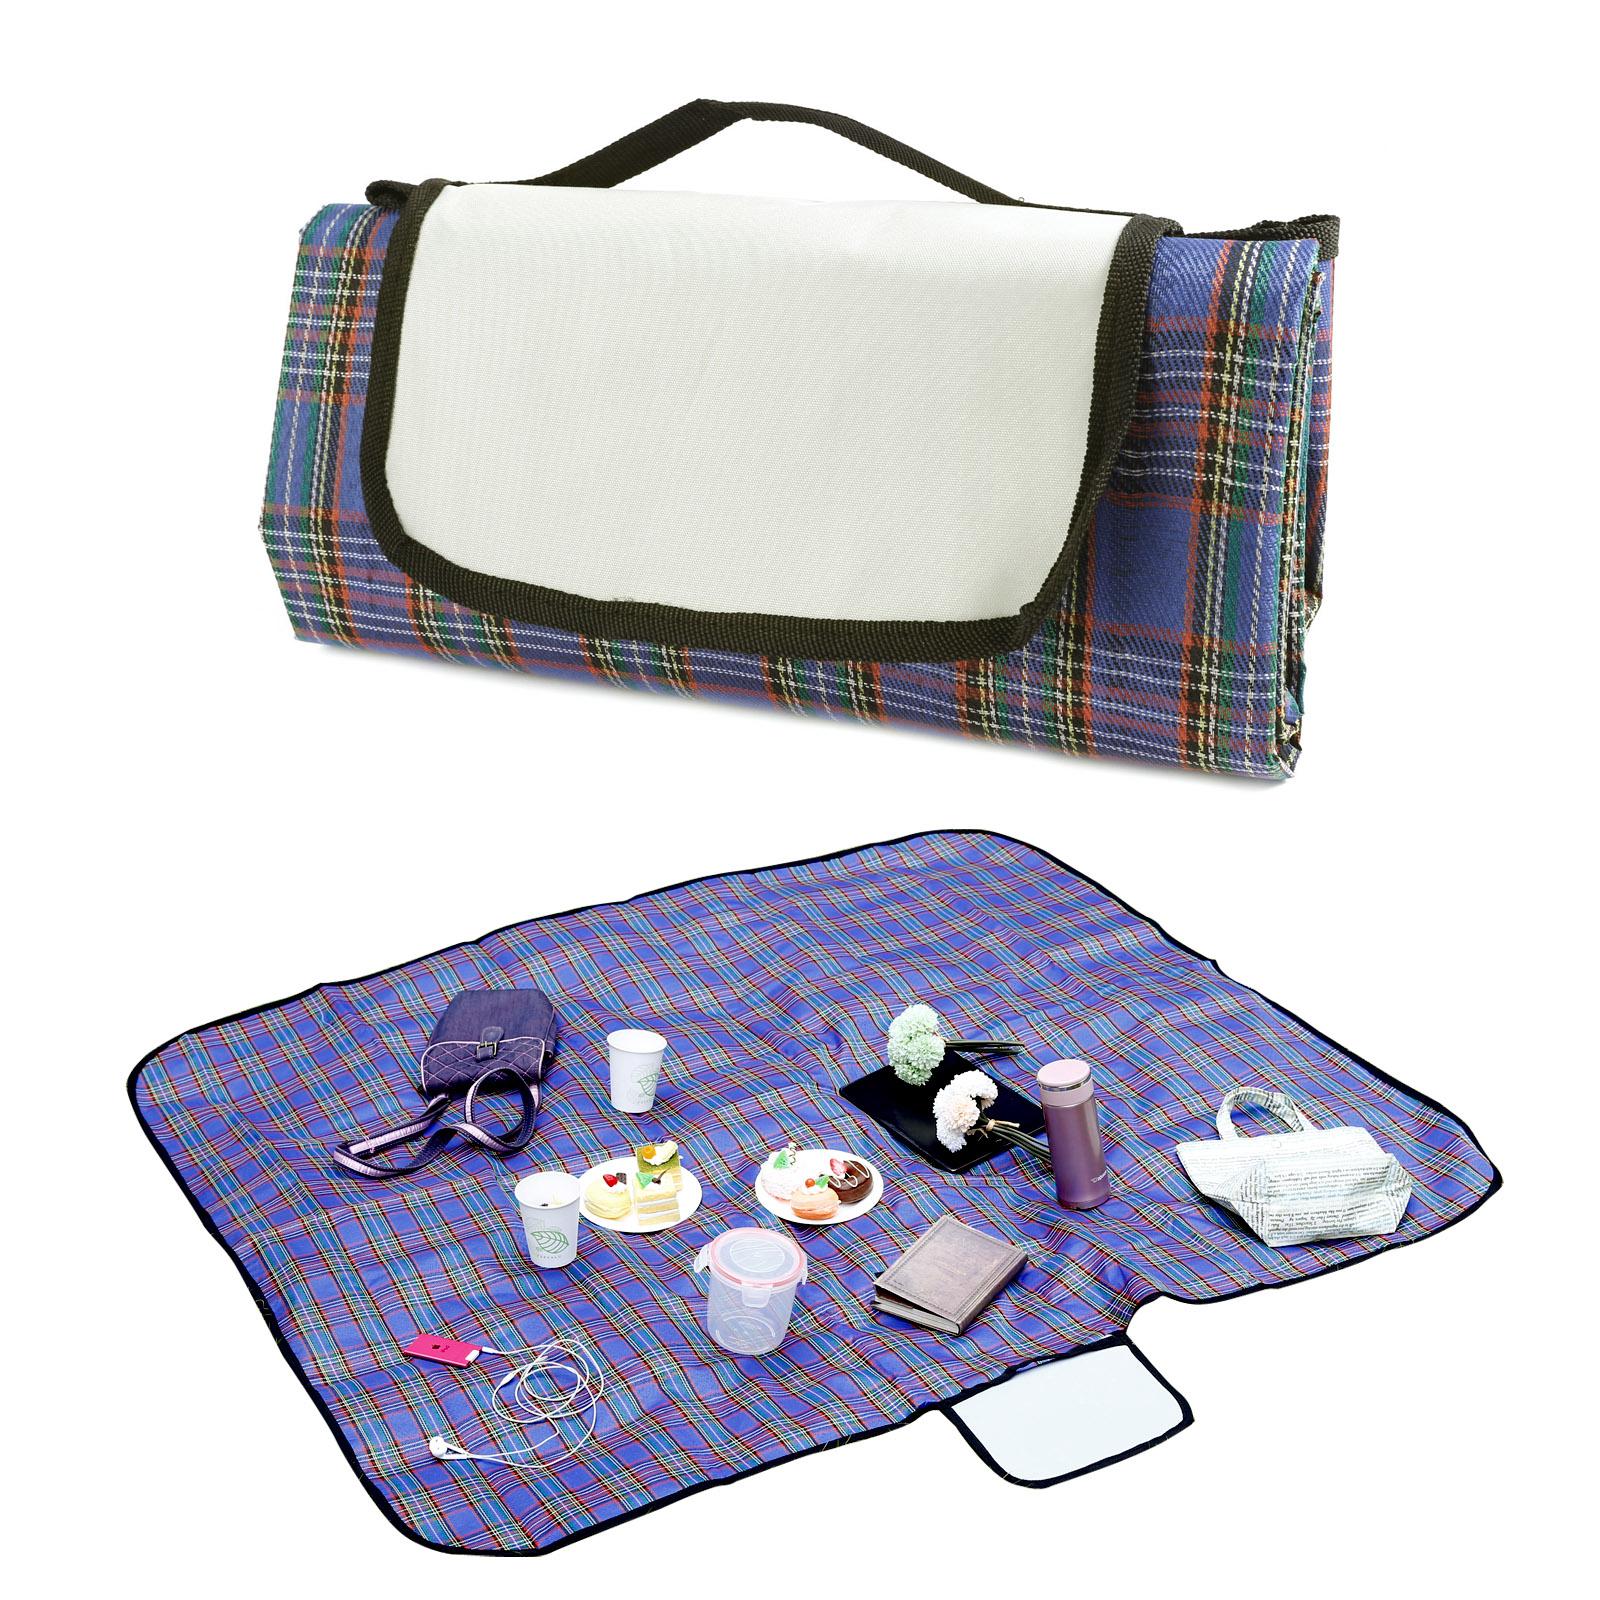 Soft Picnic Blanket Mat Rug Camping Outdoor Beach Festival Waterproof Folding UK